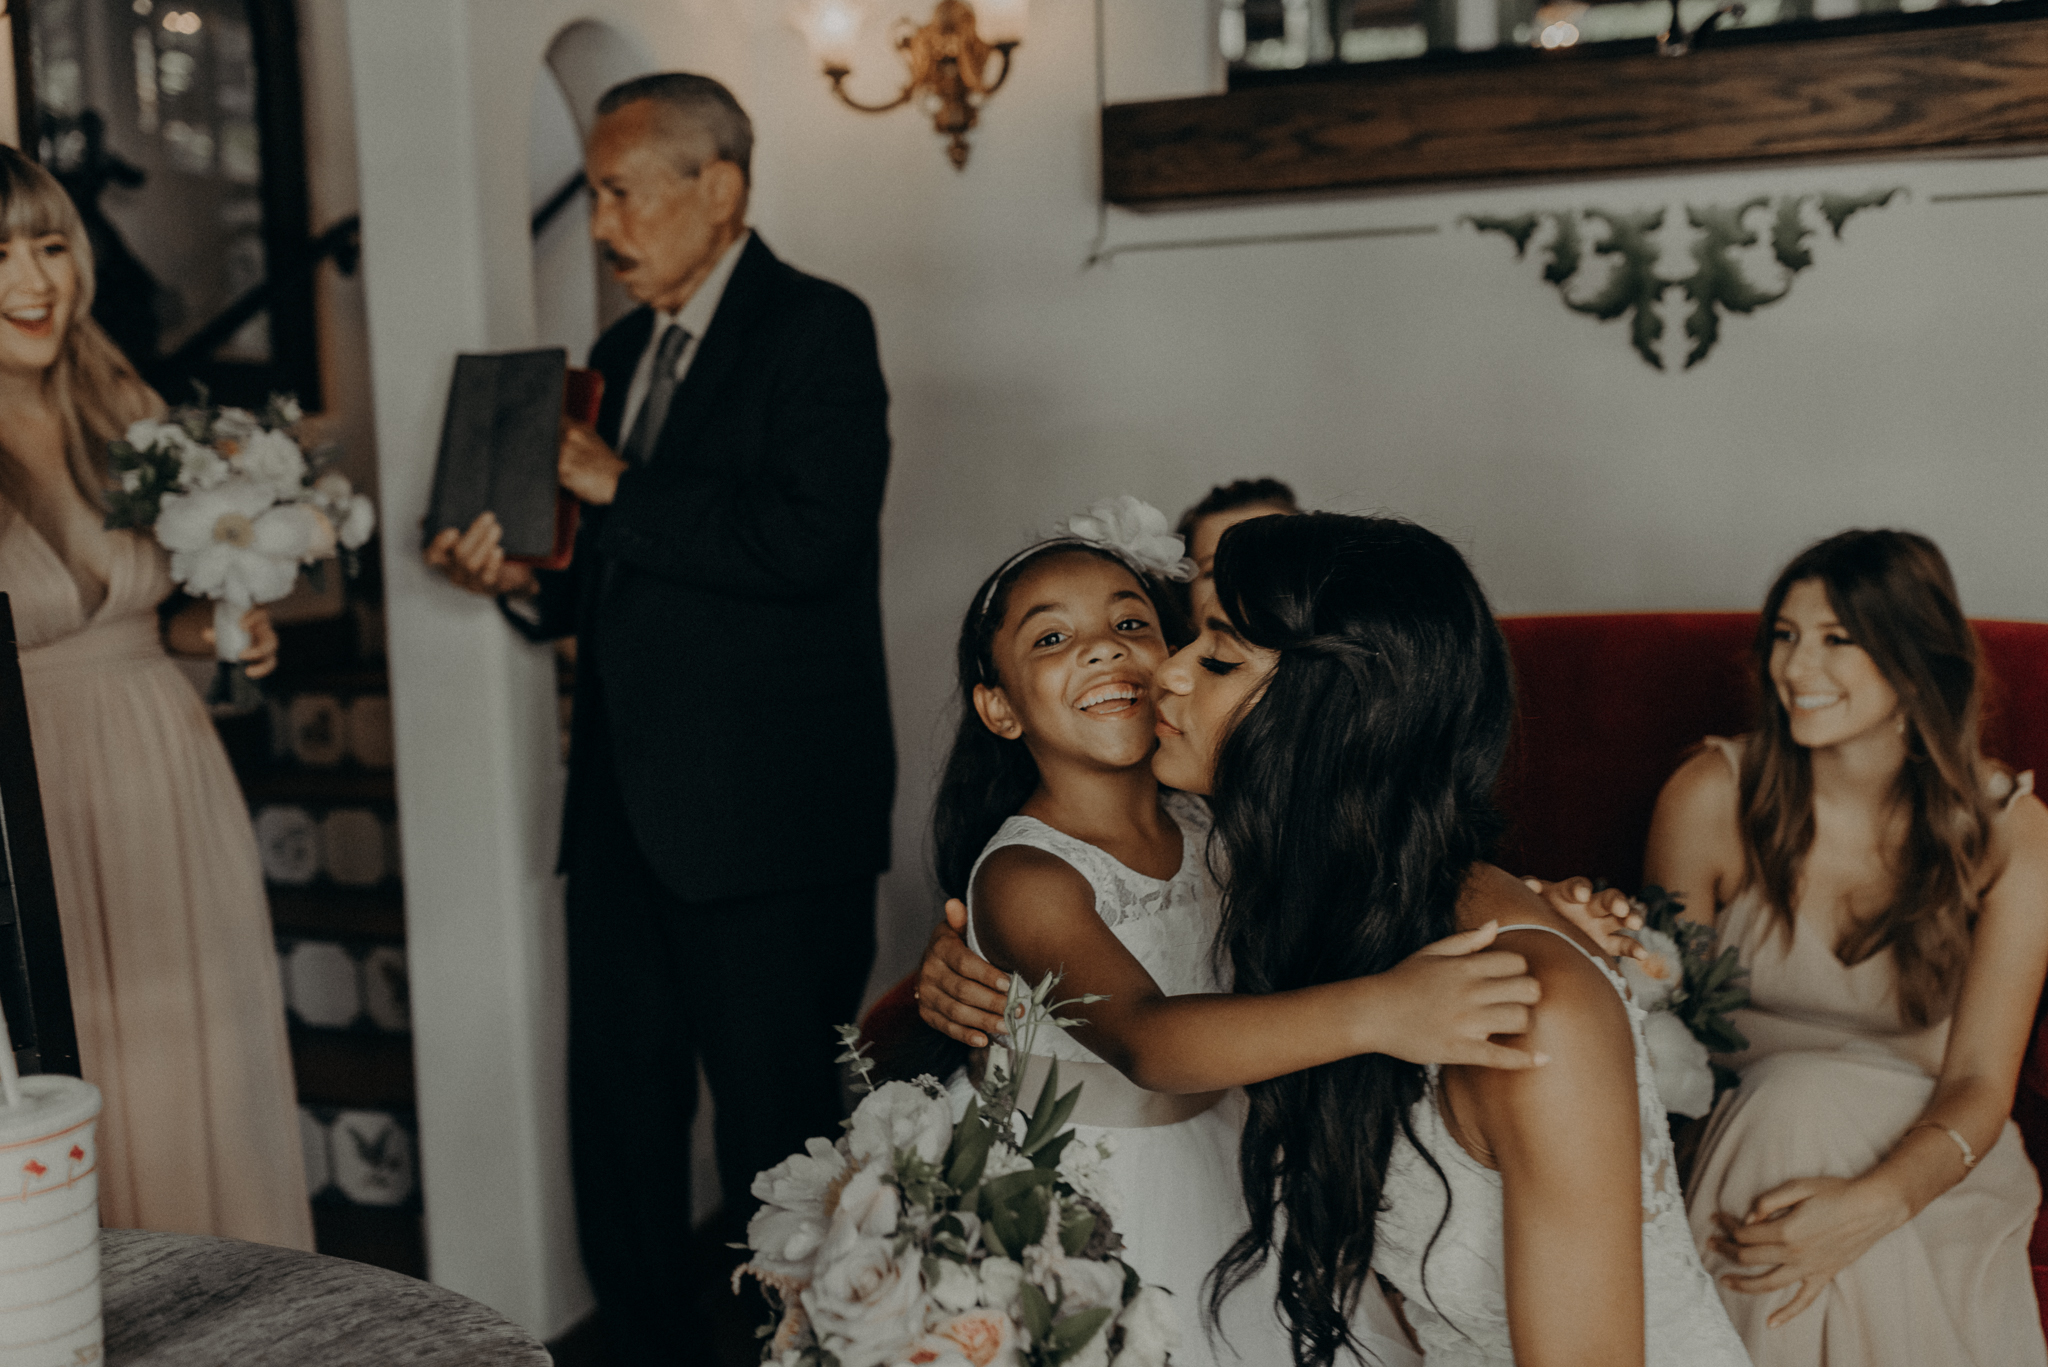 Isaiah + Taylor Photography - Rancho Las Lomas Wedding, Los Angeles Wedding Photographer-038.jpg